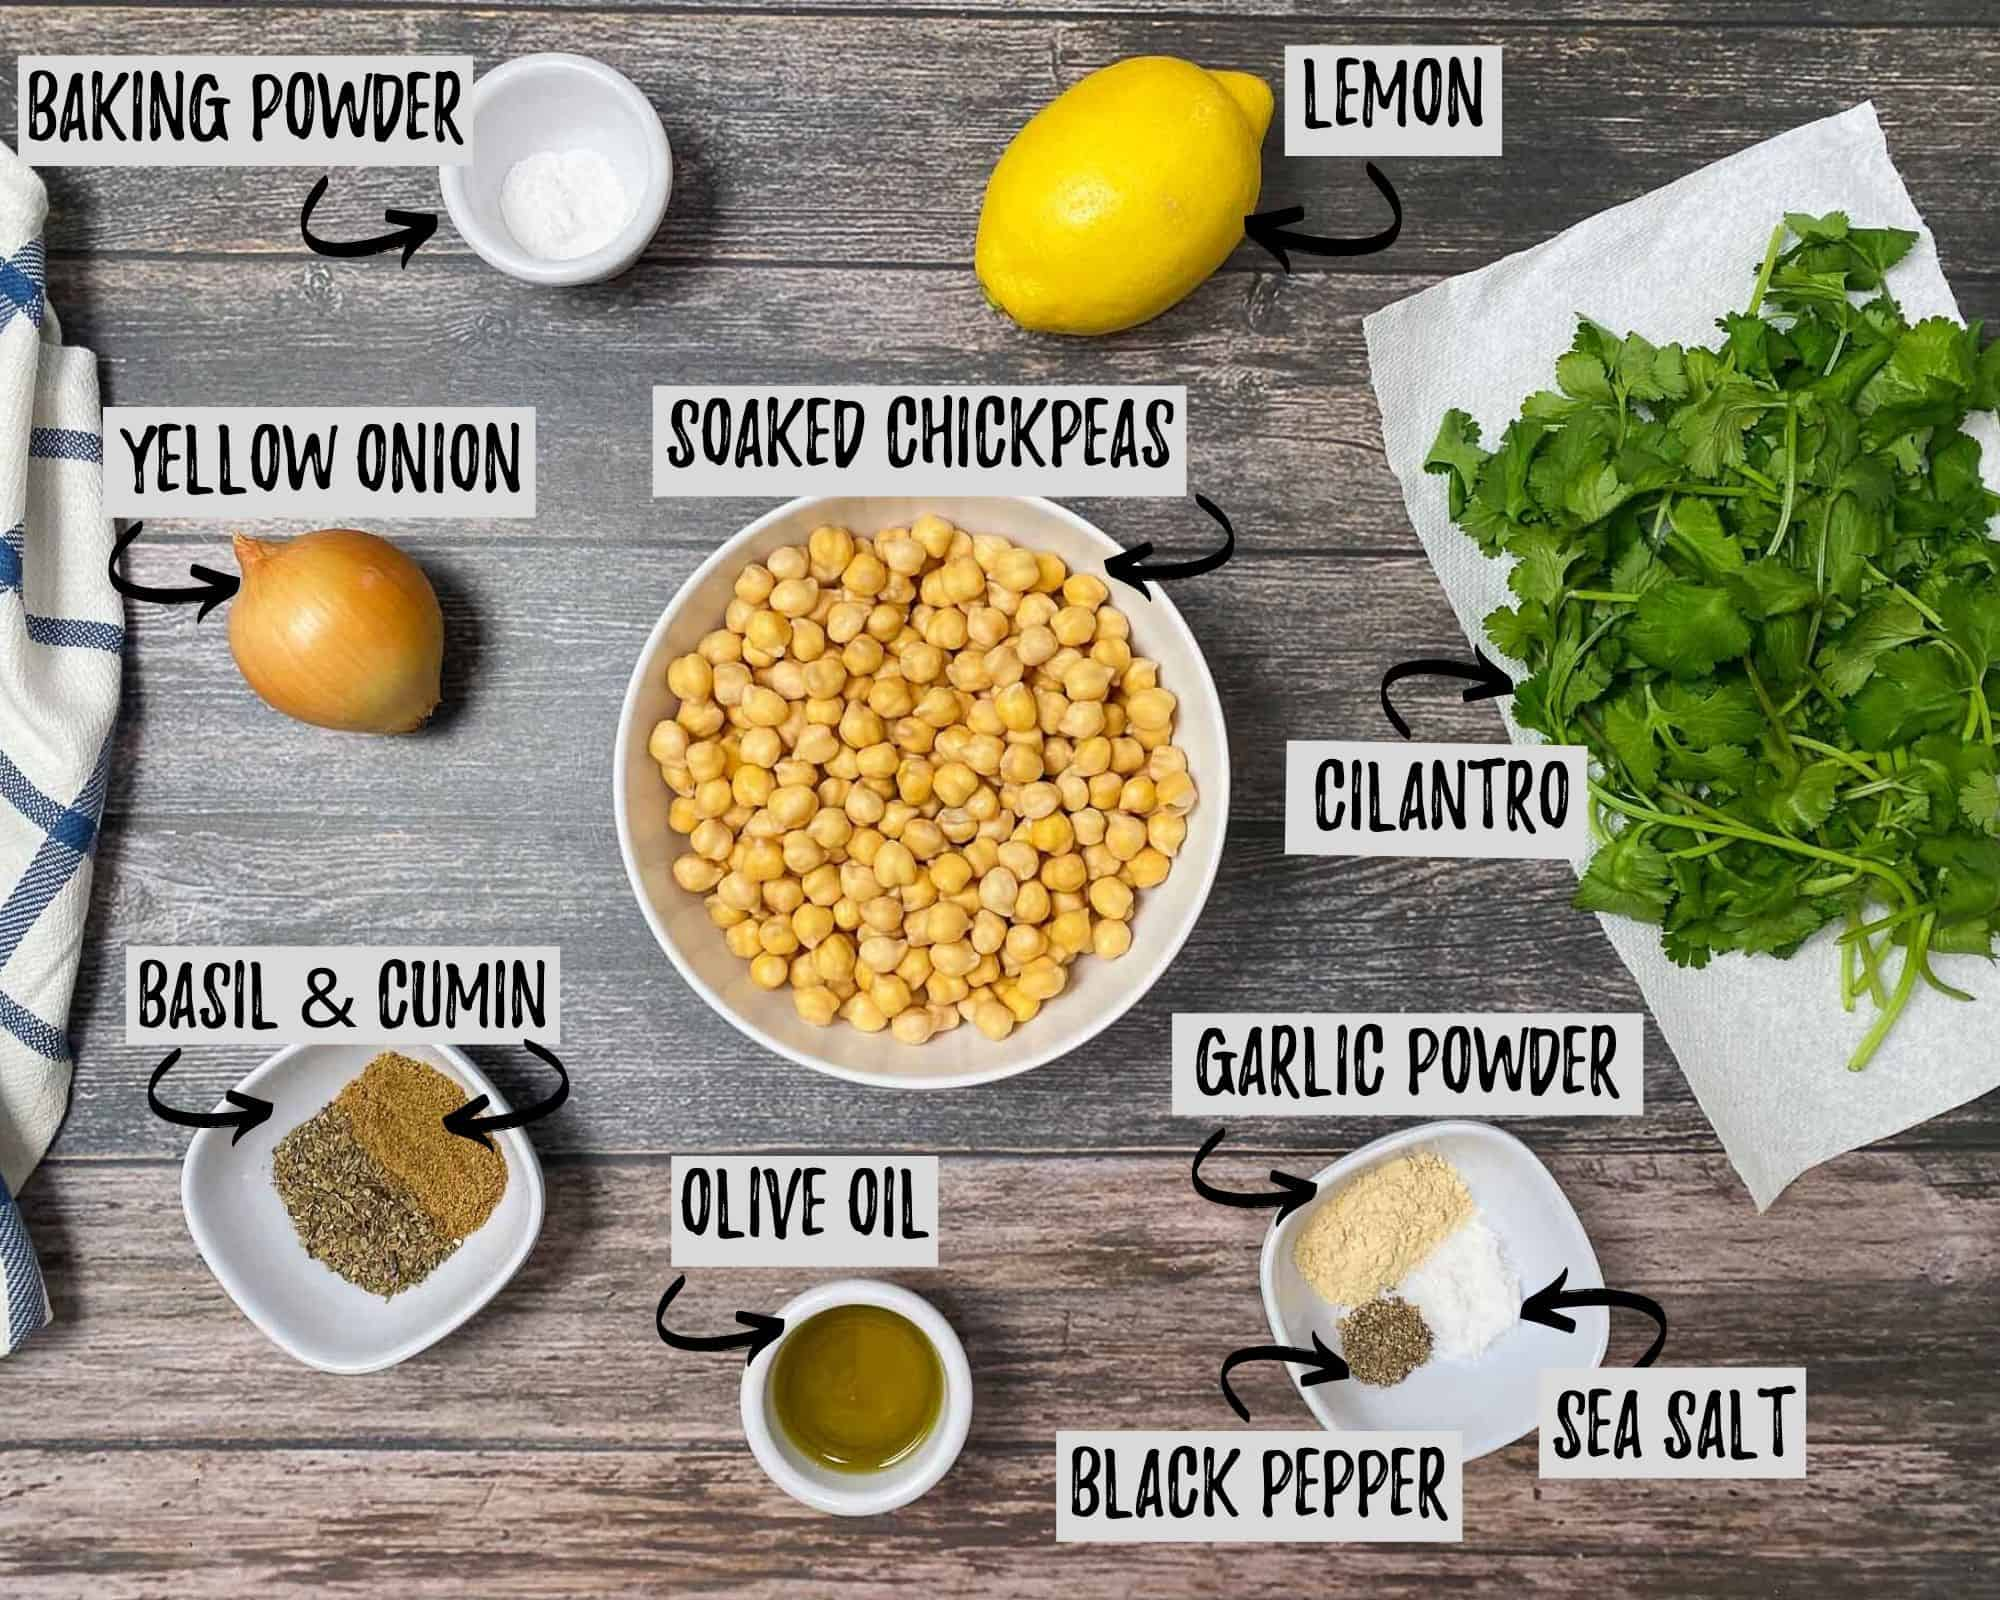 bowl of chickpeas, seasoning, olive oil, baking powder, lemon, onion, and cilantro on grey deck